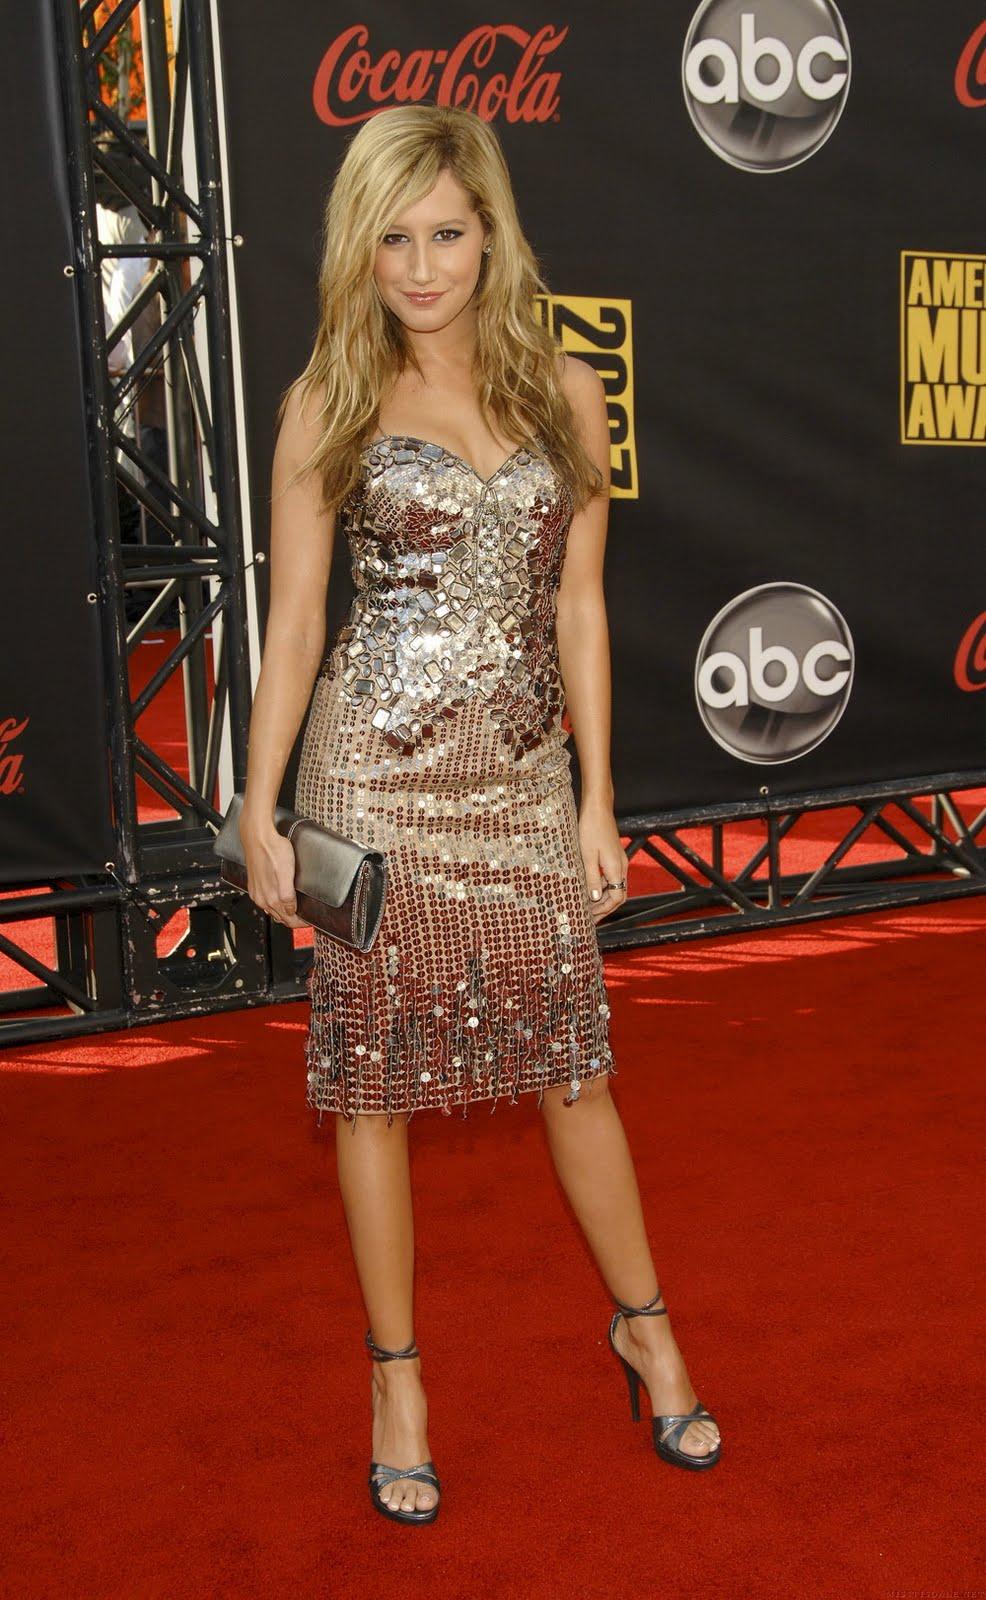 Ashley tisdale red carpet dresses - photo#18